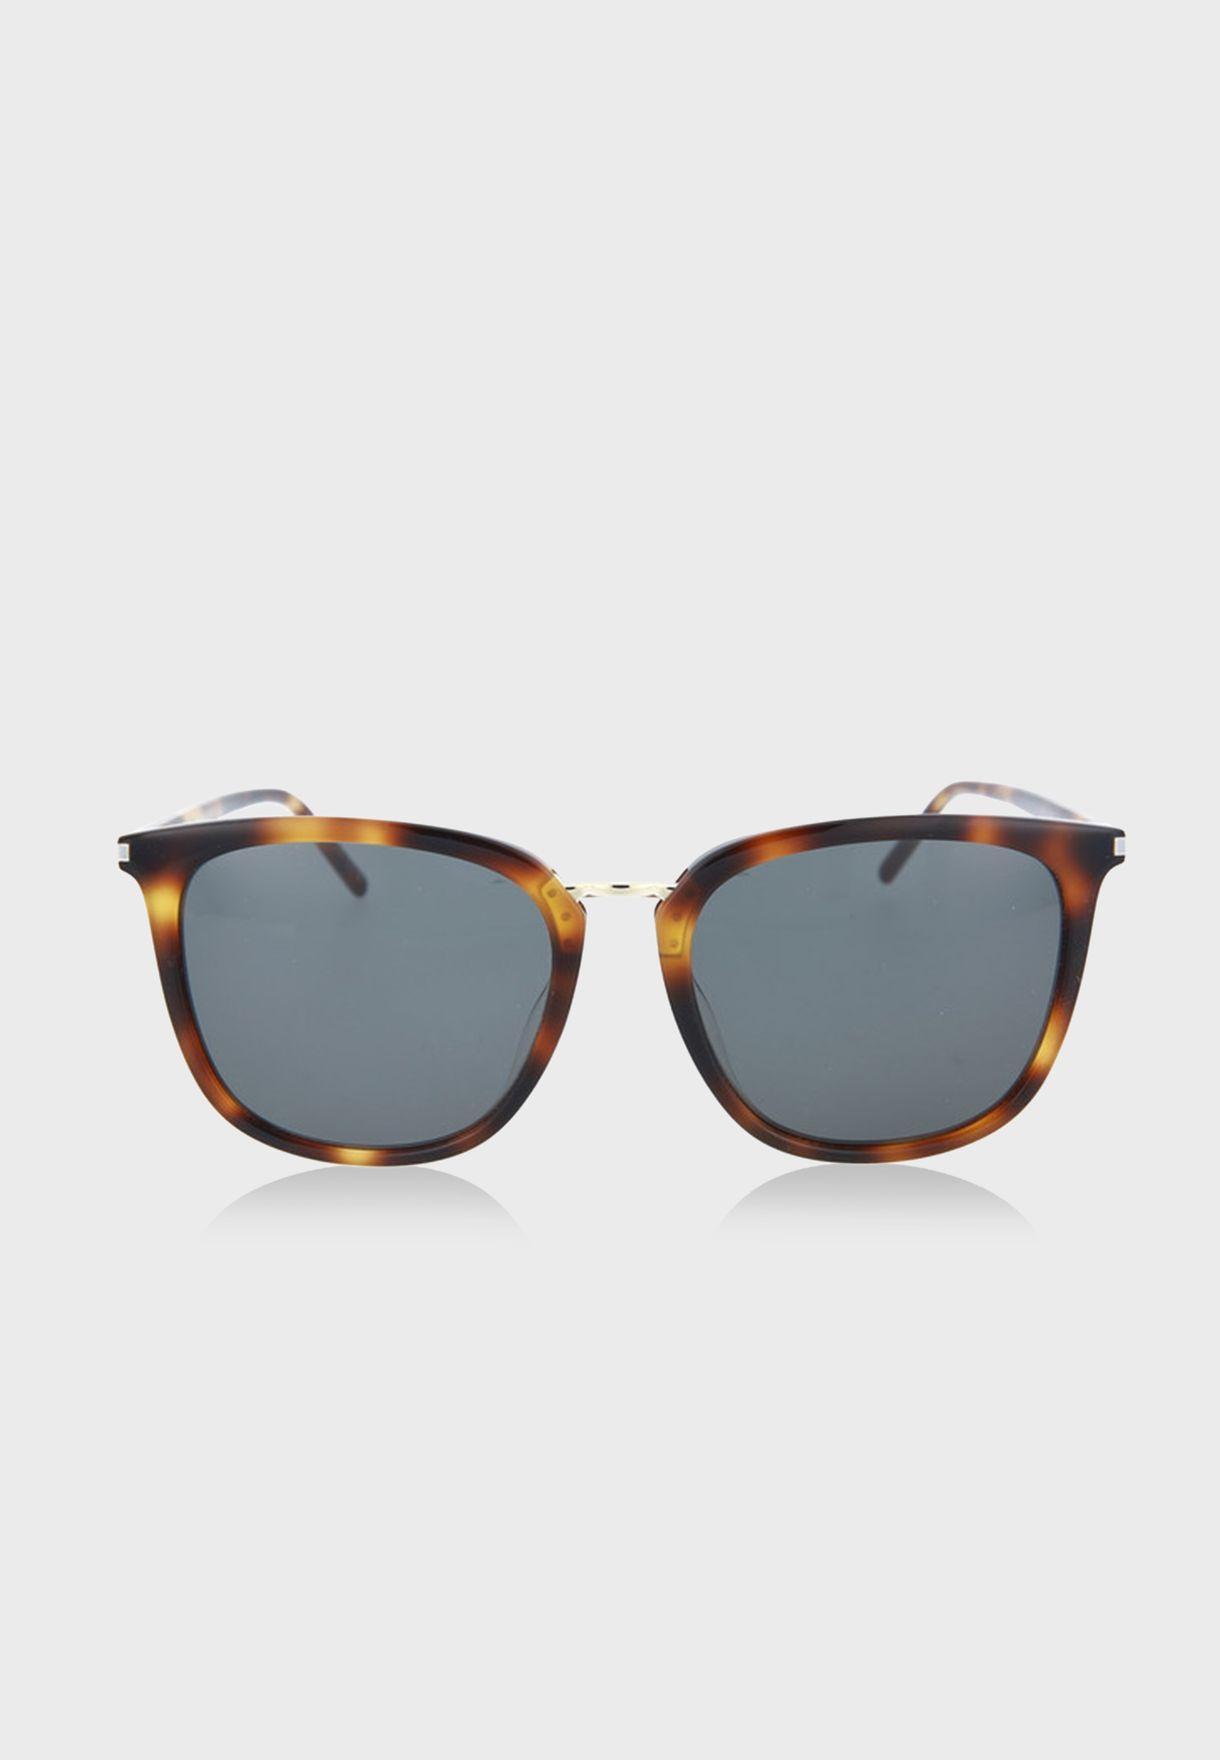 SL131-30001087002 Square Sunglasses